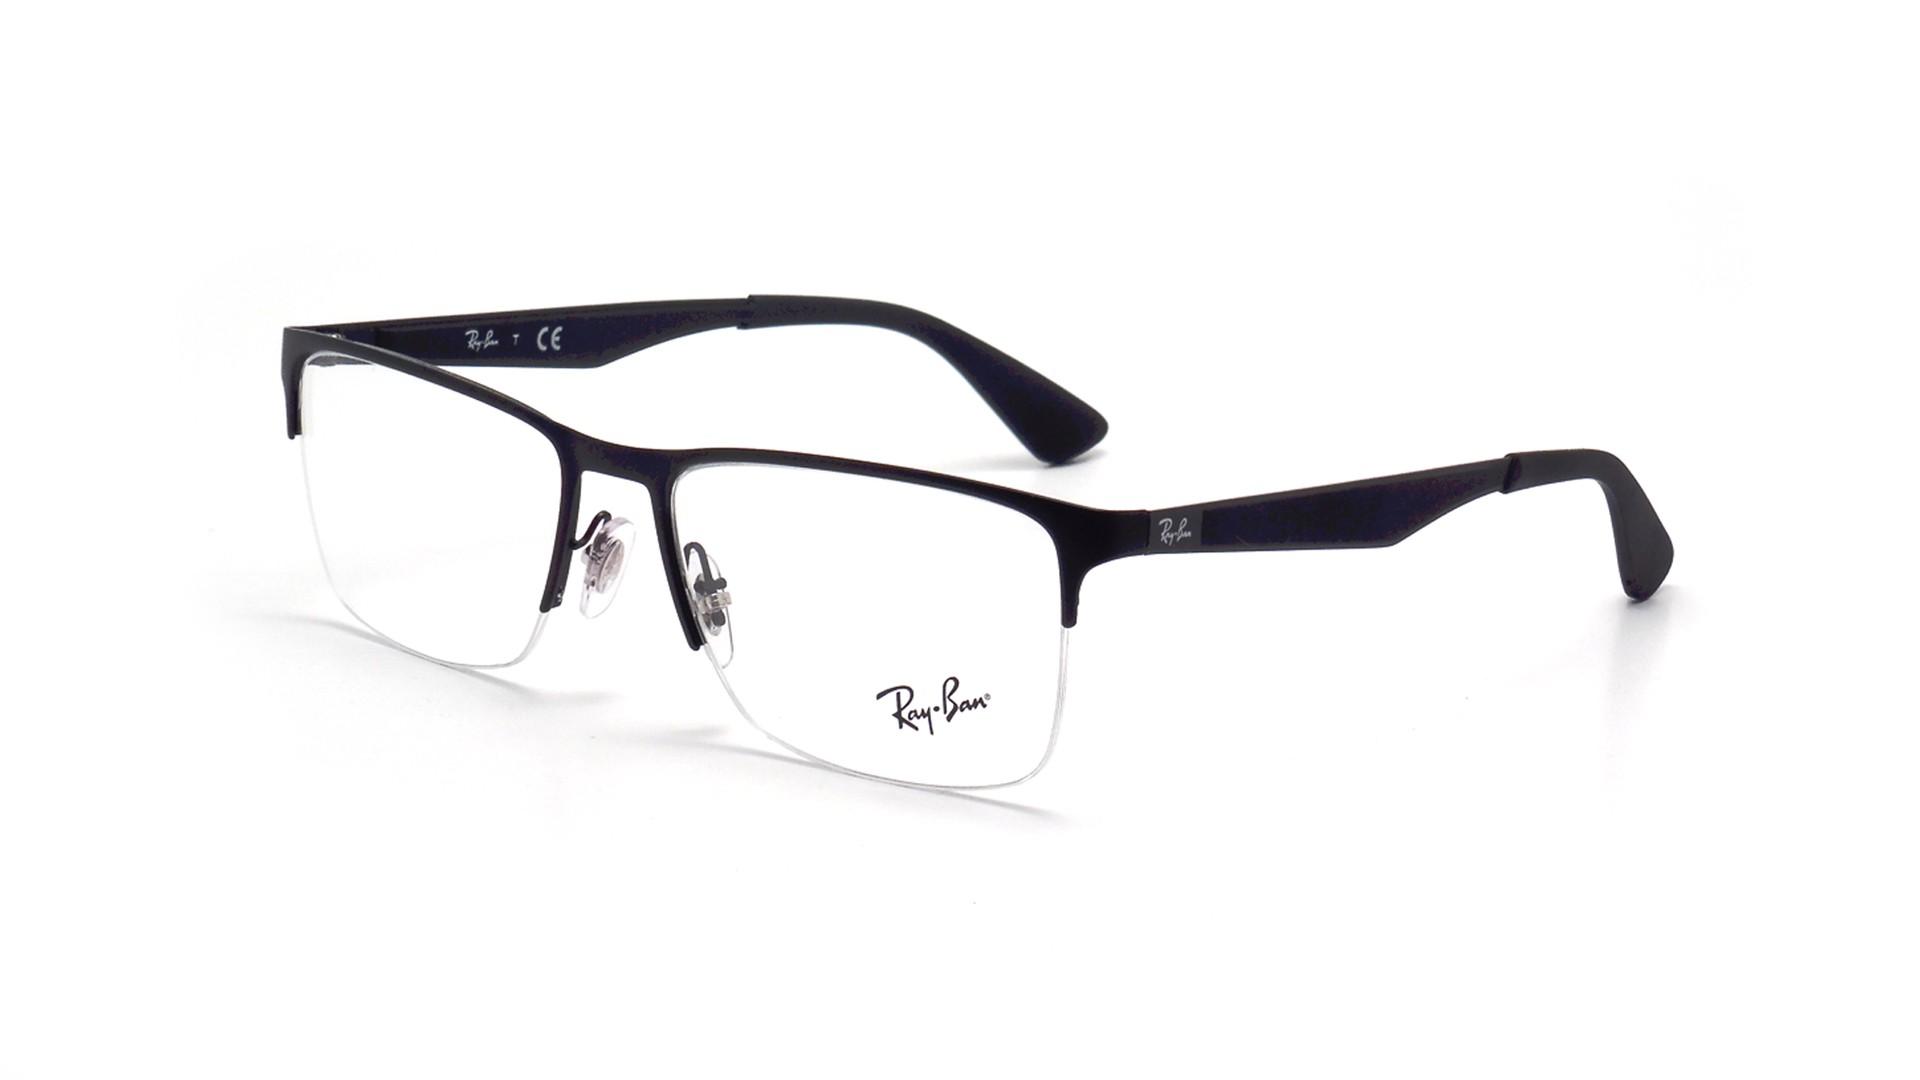 417a52eac07 Eyeglasses Ray-Ban RX6335 RB6335 2503 54-17 Black Medium